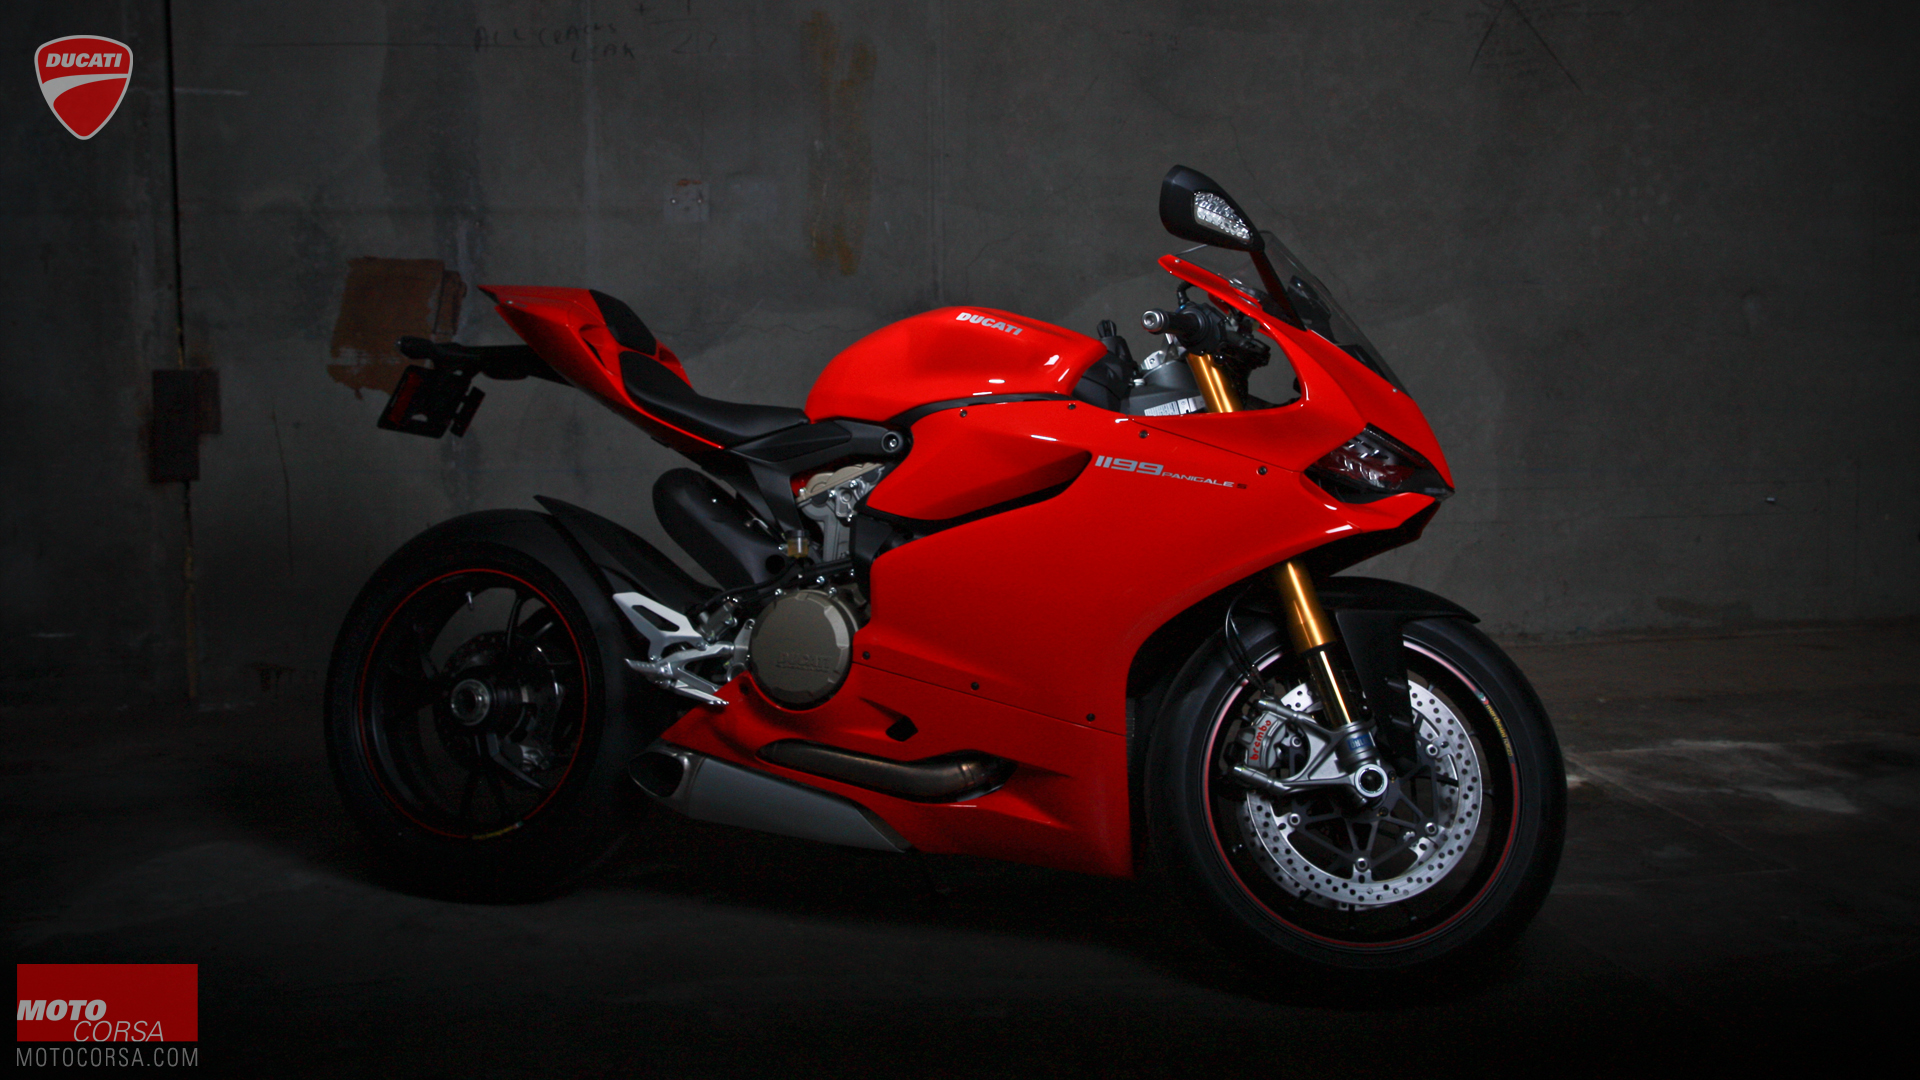 Ducati Panigale wallpaper 205856 1920x1080